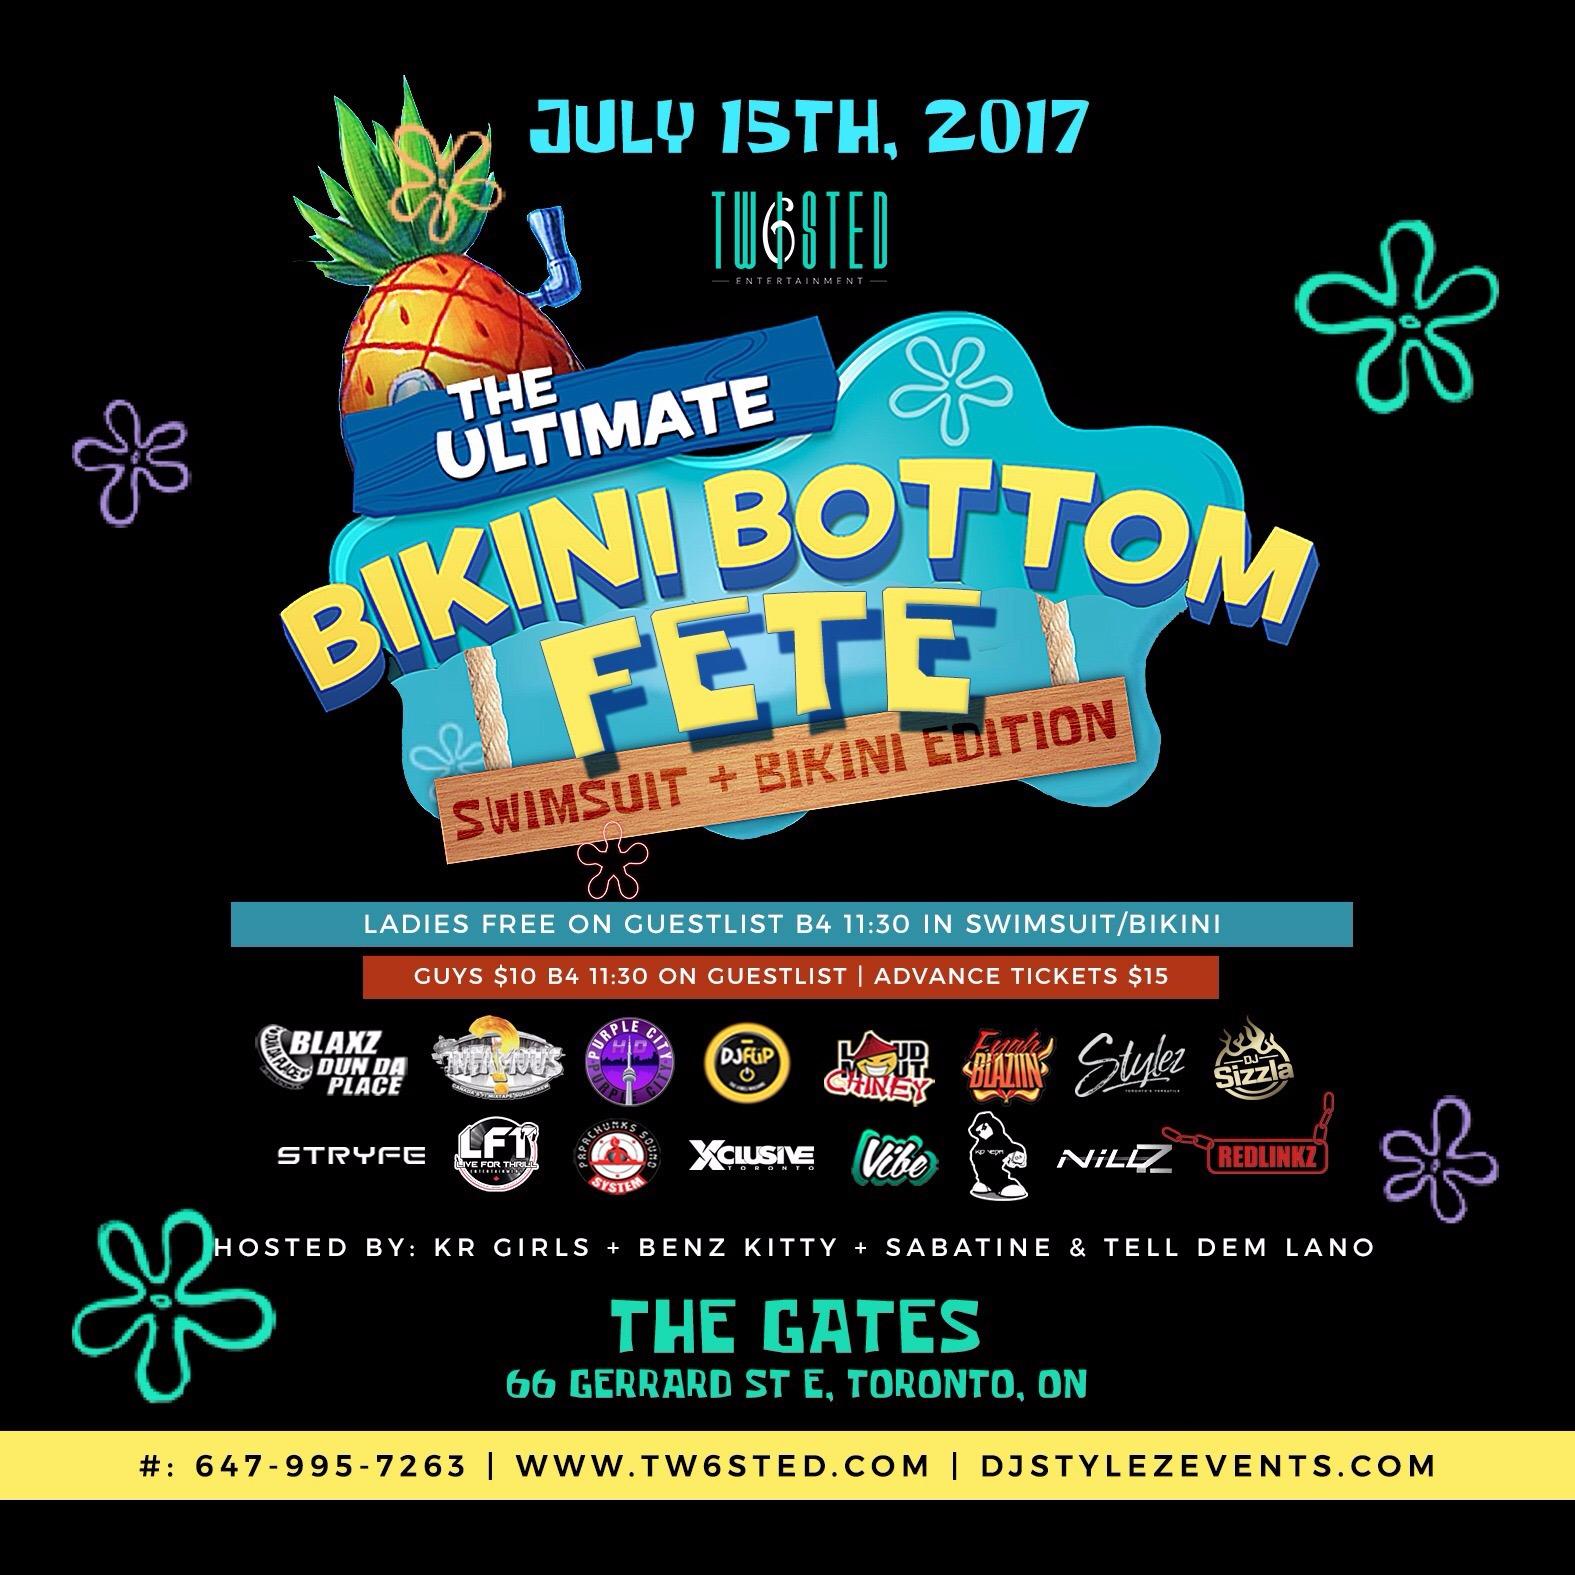 BIKINI BOTTOM FETE | SWIMSUIT + BIKINI EDITION | JULY 15TH, 2017